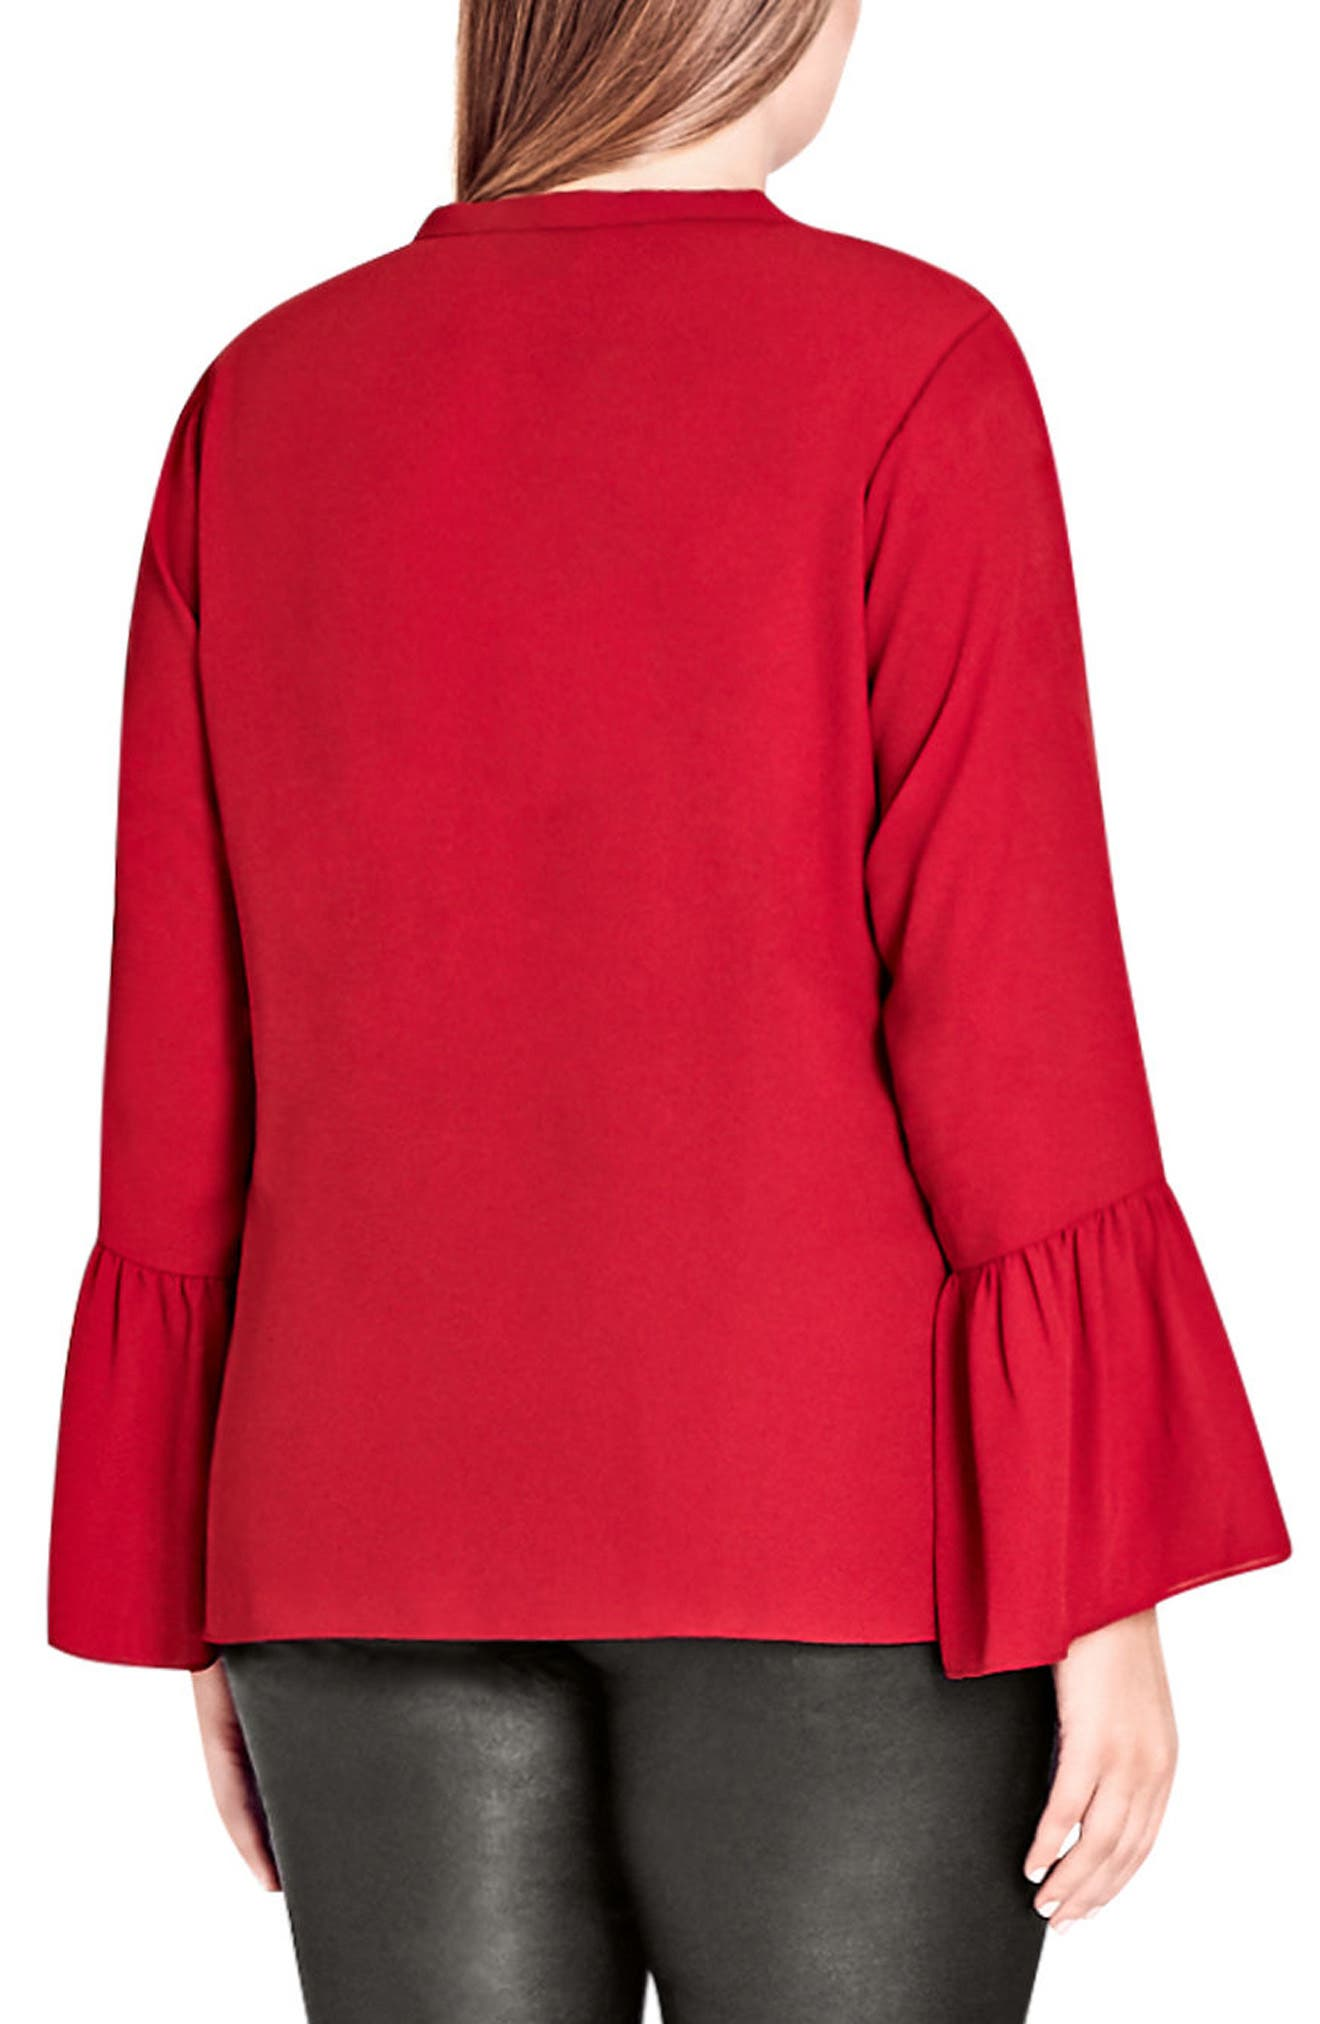 Office Fling Shirt,                             Alternate thumbnail 2, color,                             Red Rose